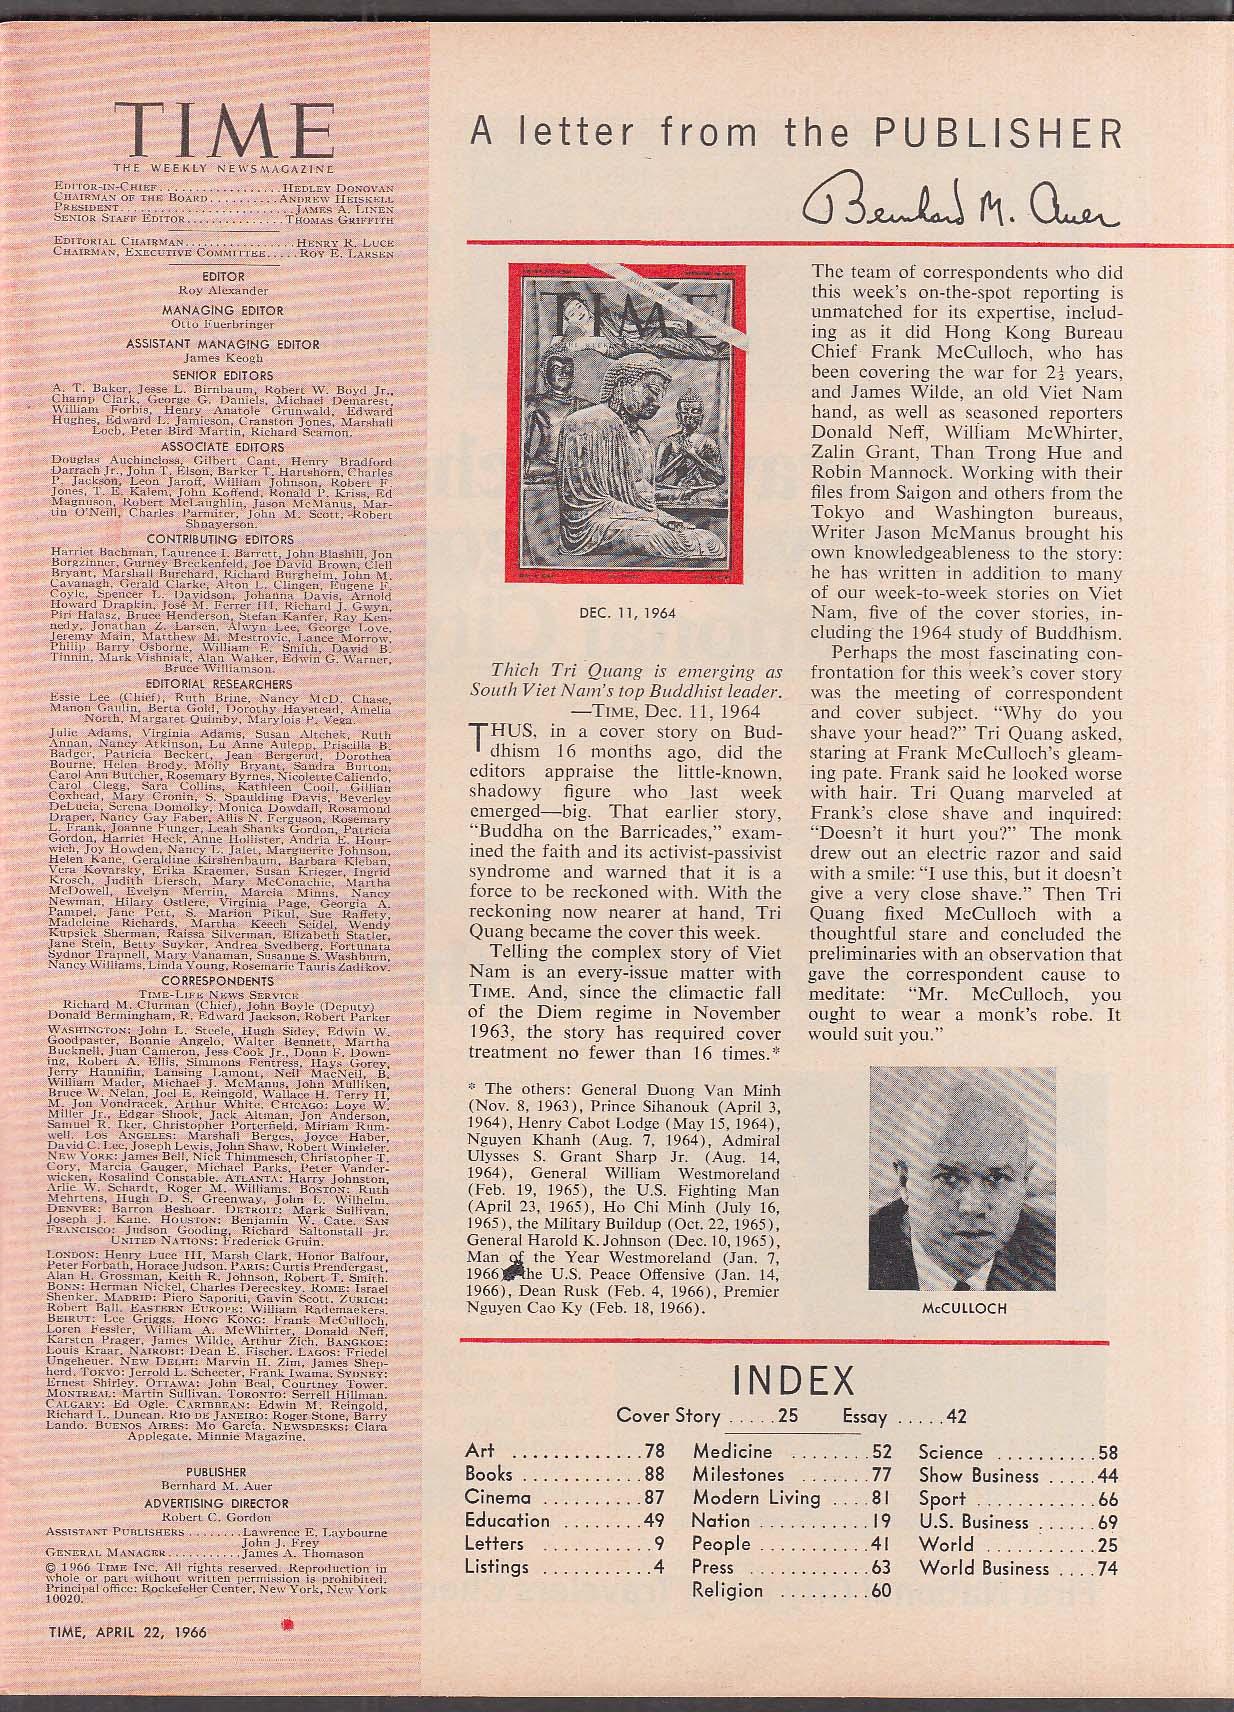 TIME South Viet Nam Buddhist Thich Tri Quang LBJ Gyrojet 4/22 1966